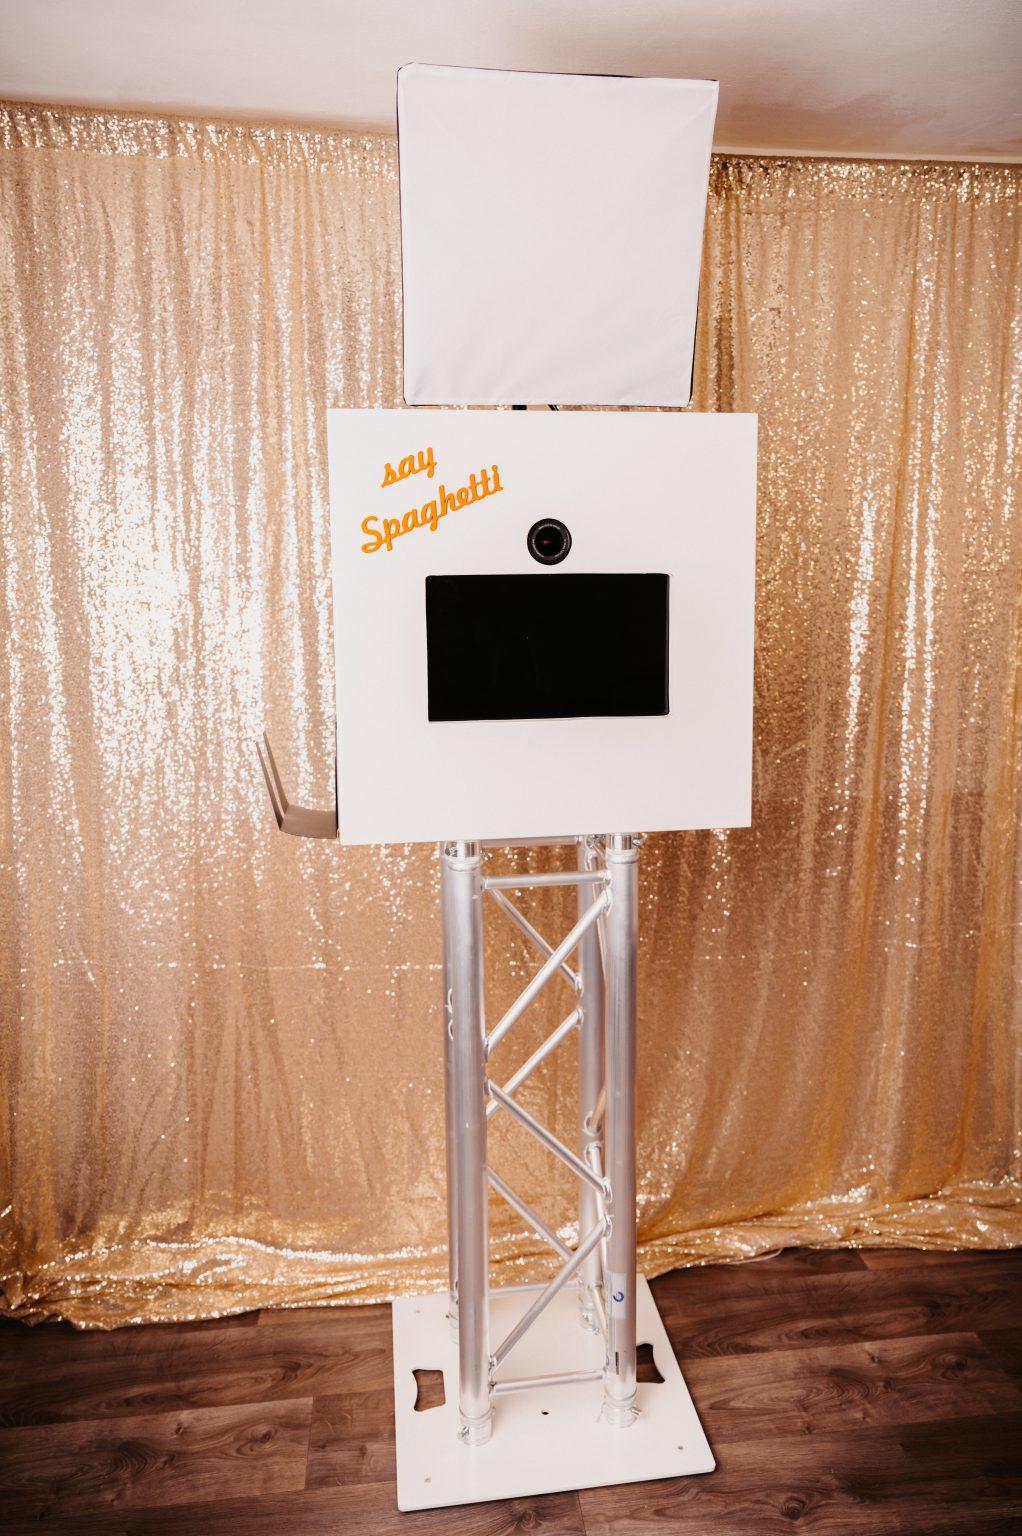 Fotobox Photobooth